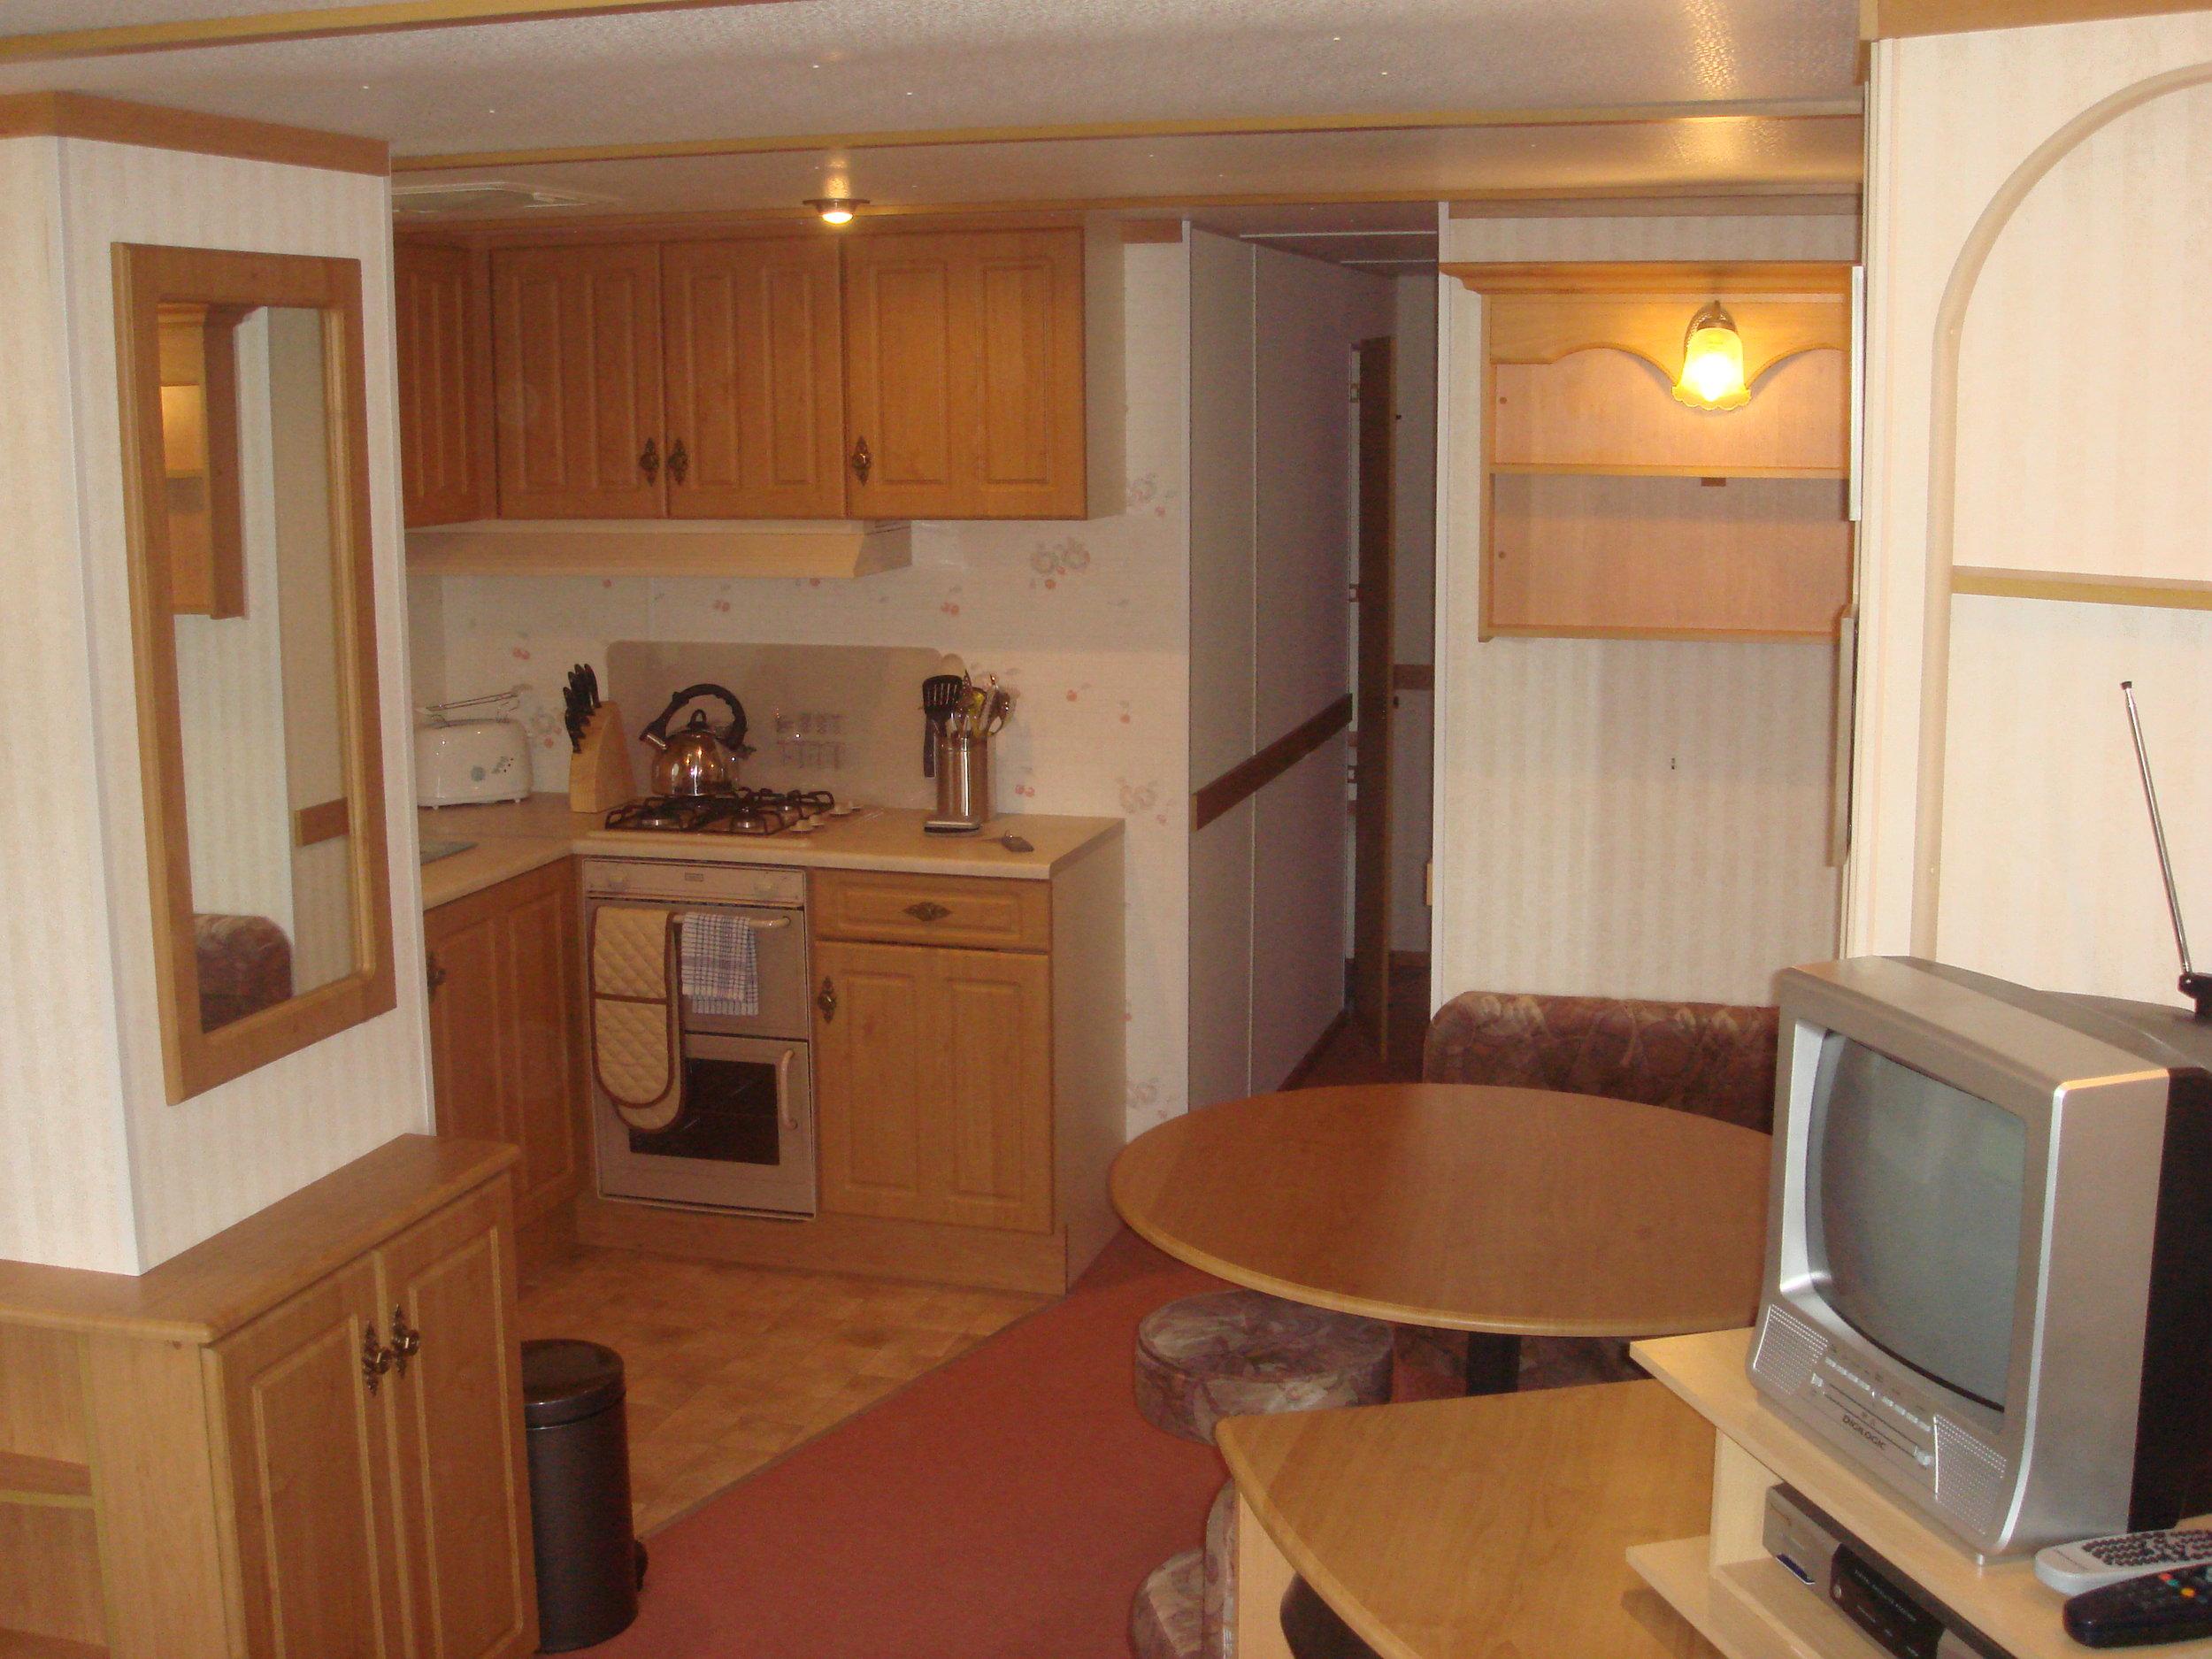 Kitchen and dining area - Caravan 2 Lorton Vale Caravans lortonvalecaravans.co.uk